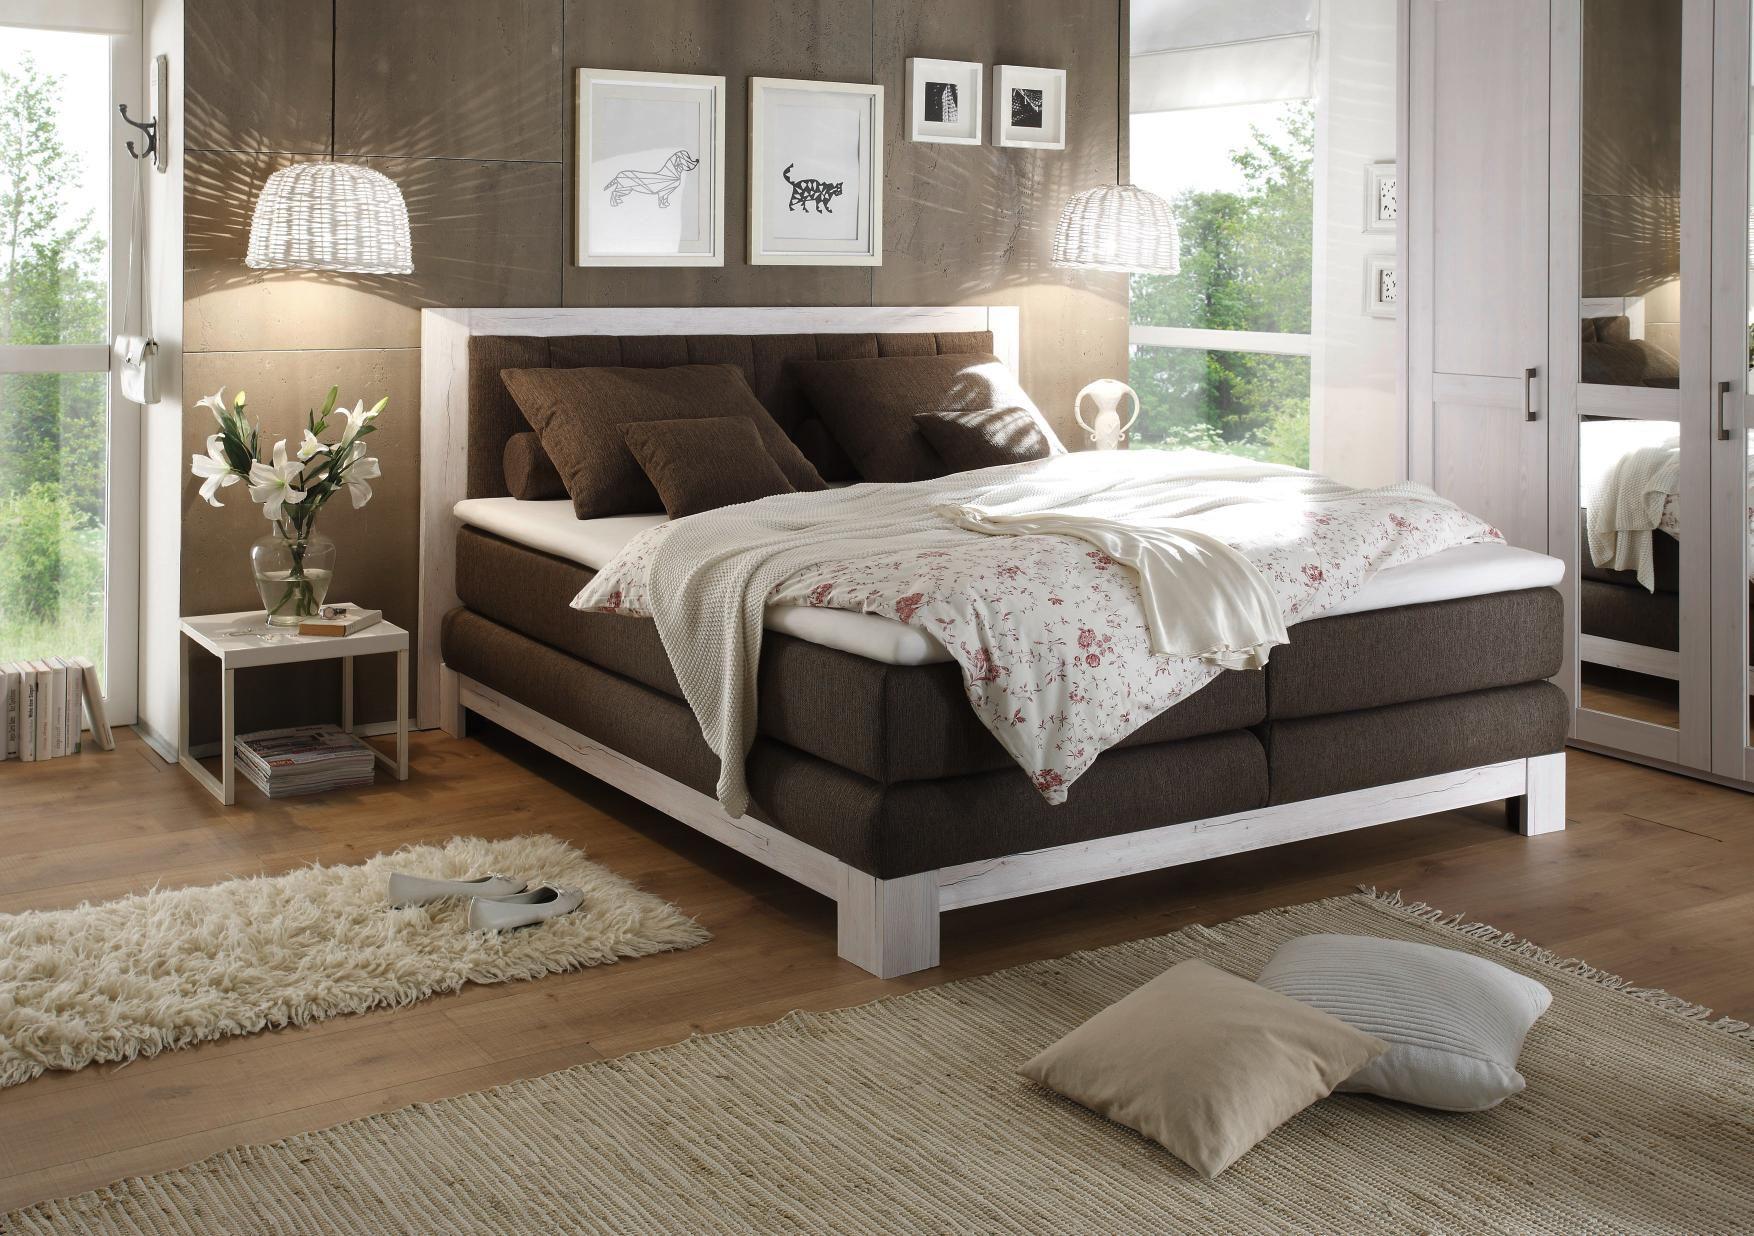 boxspringbett von carry home schlafzimmer pinterest. Black Bedroom Furniture Sets. Home Design Ideas